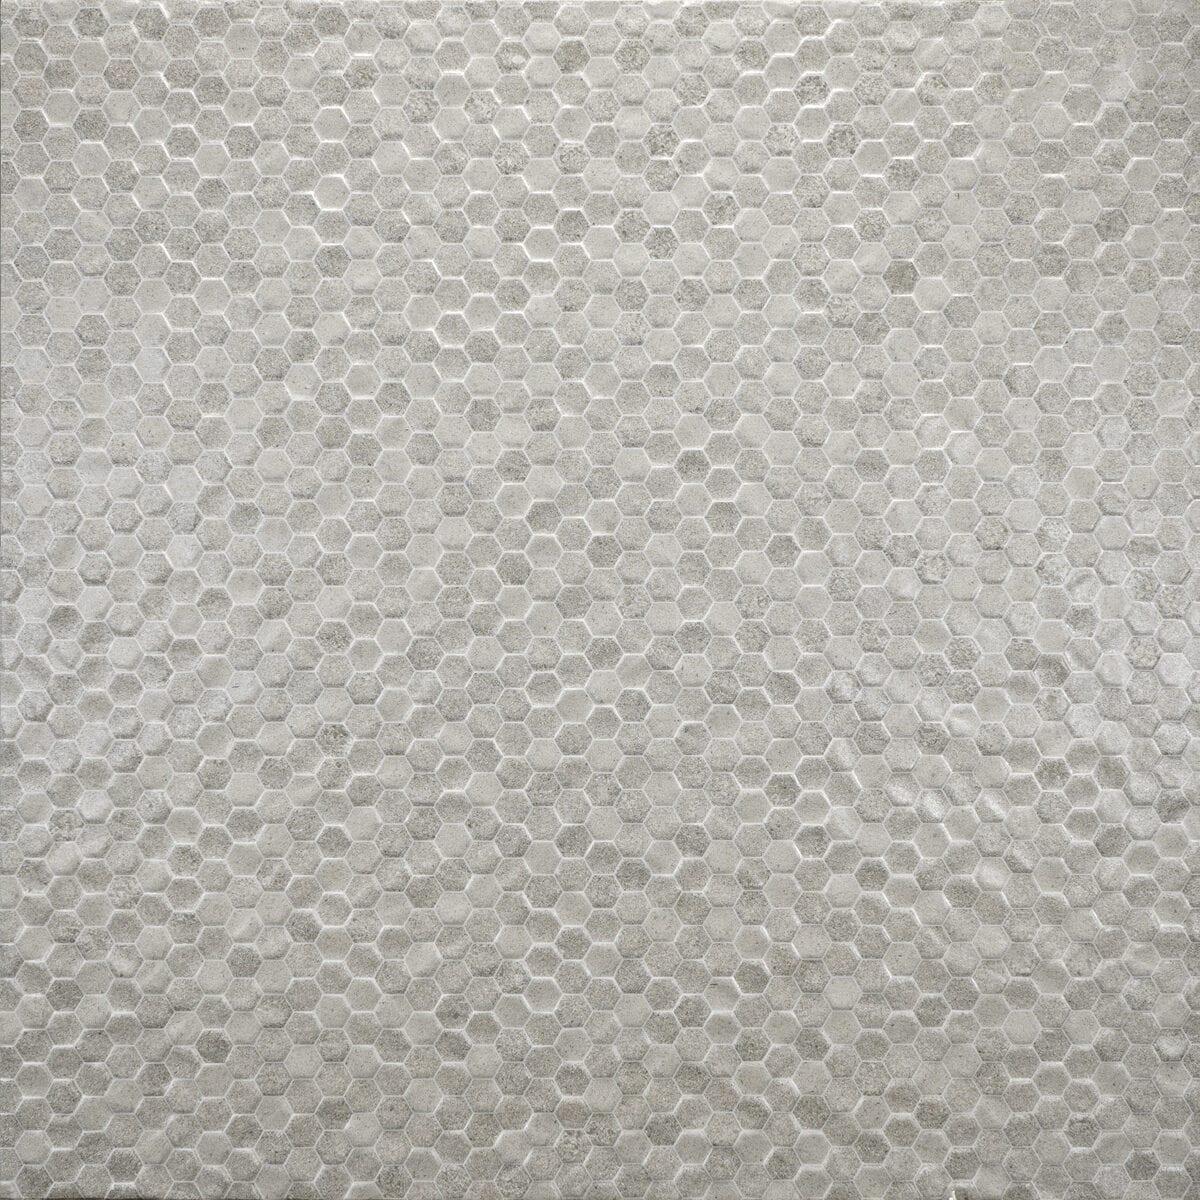 archistone light grey 24x24 d00103